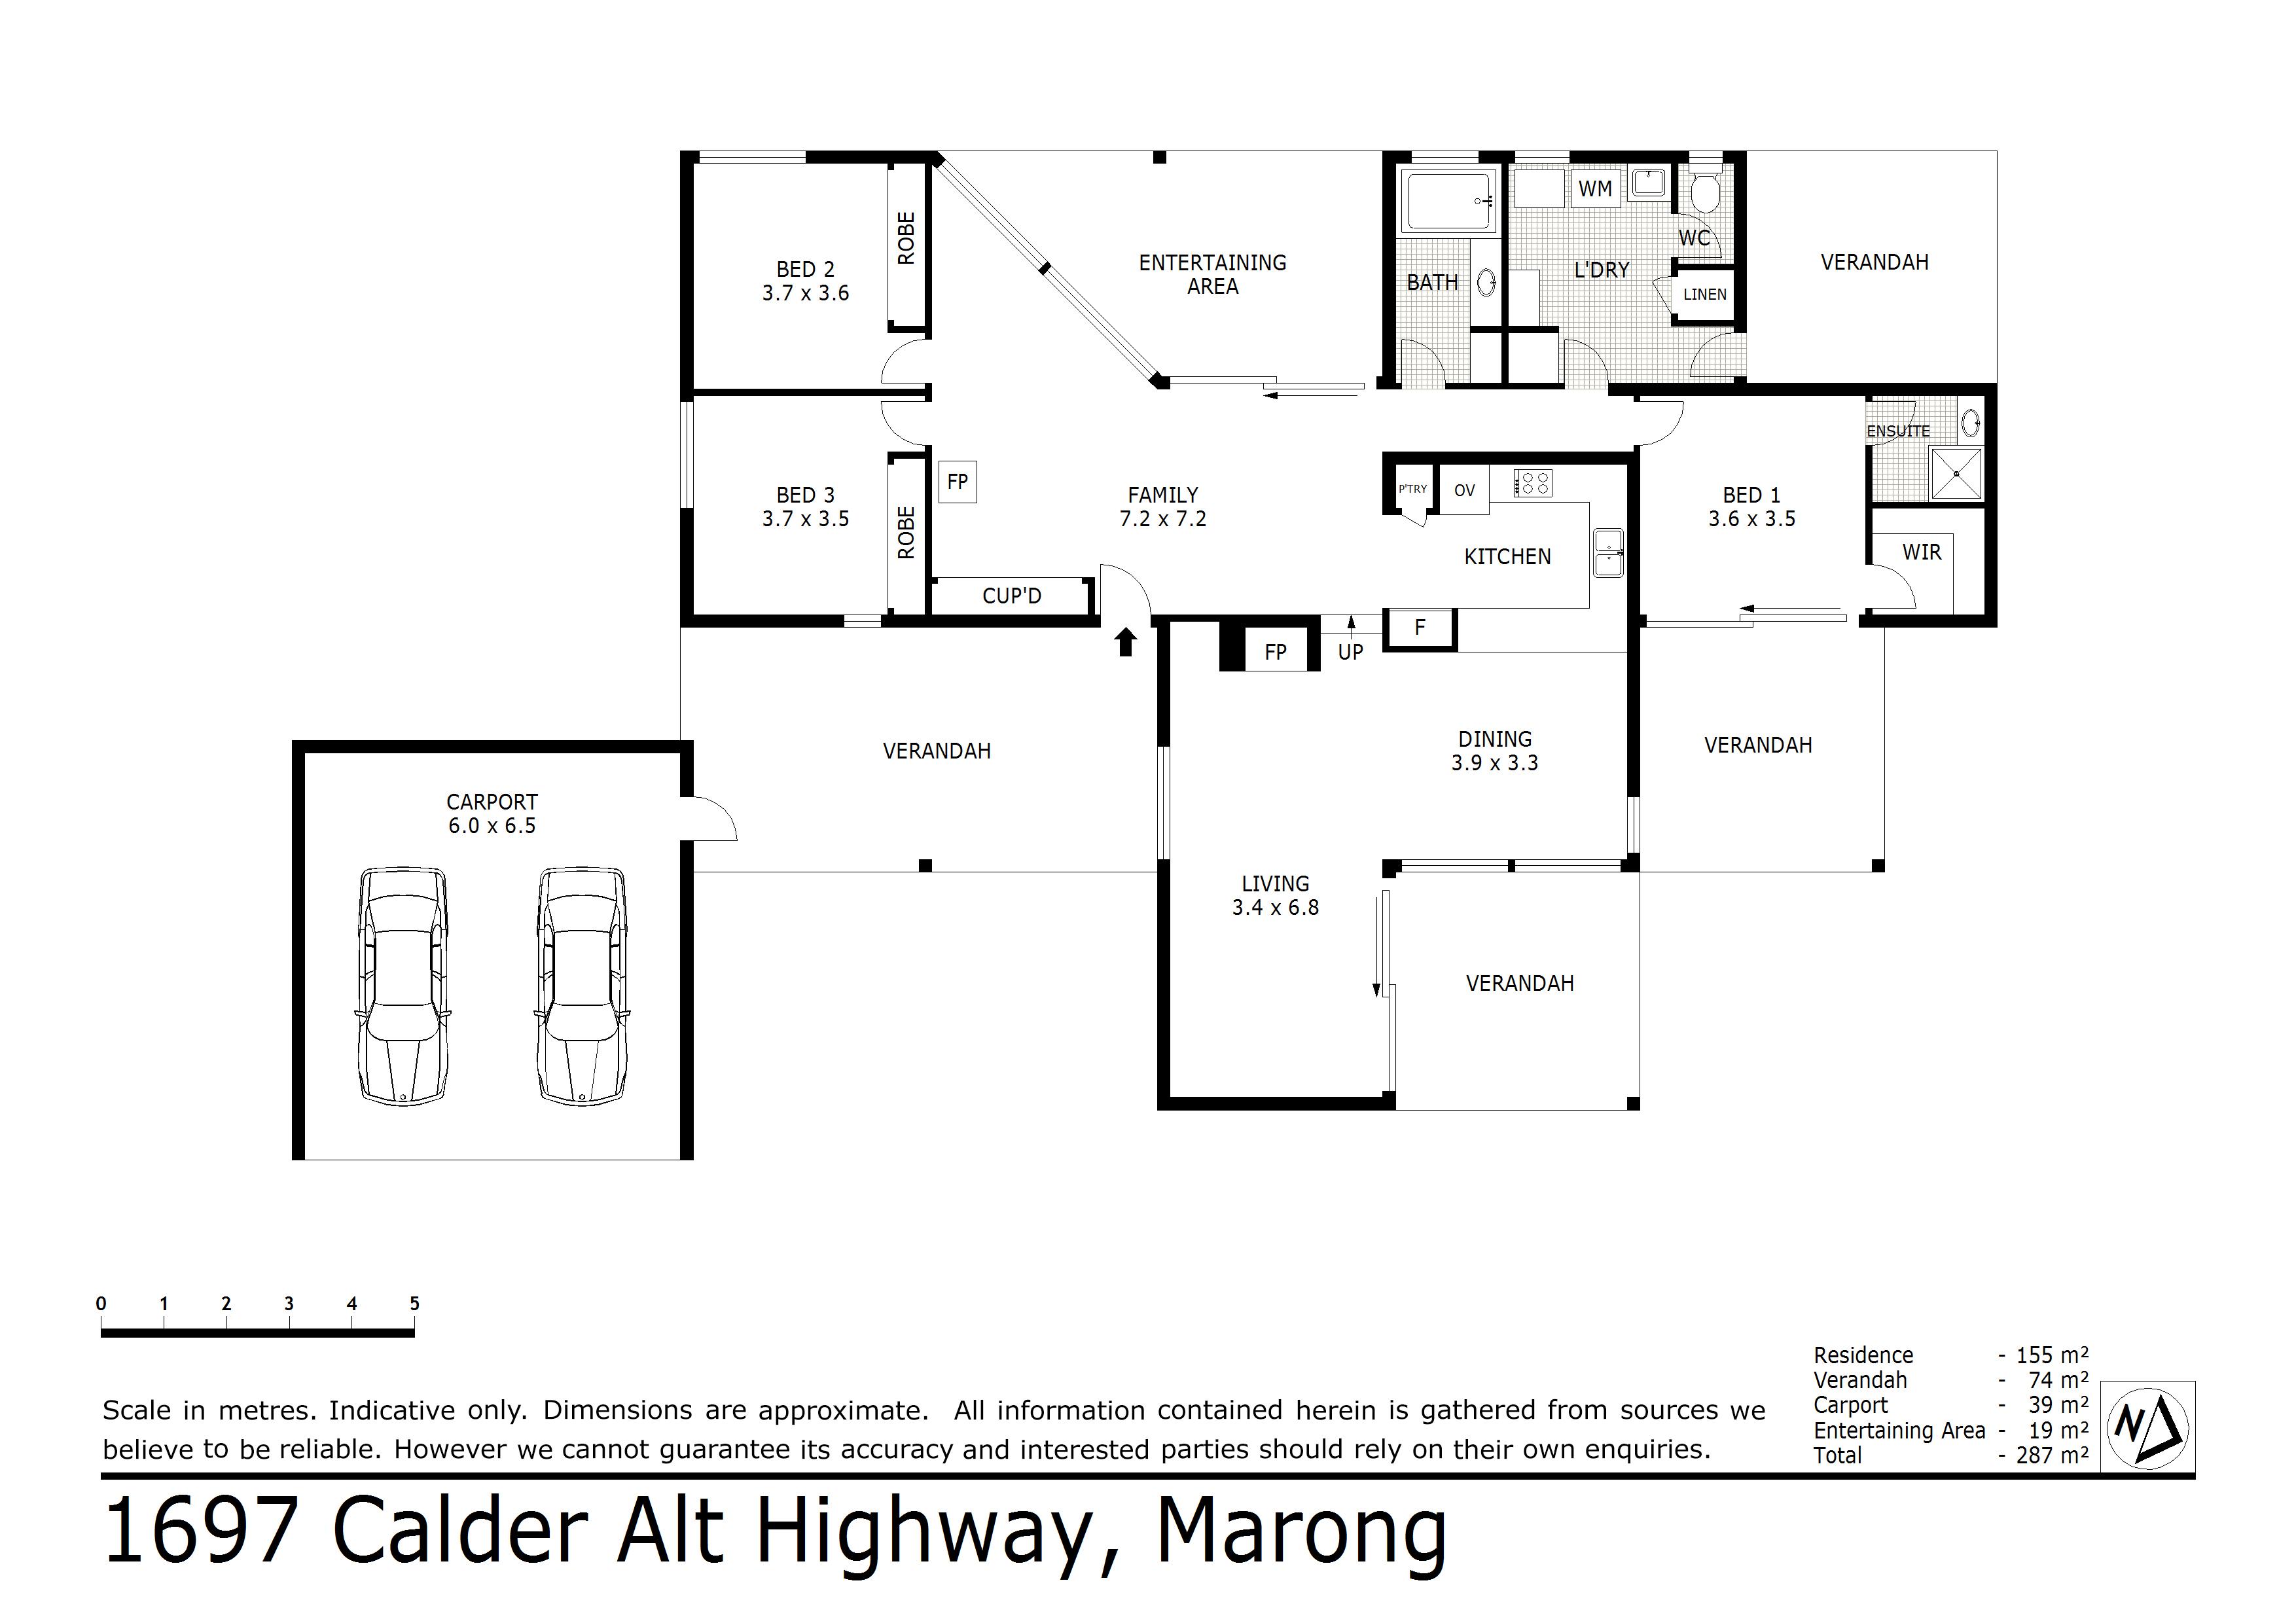 1697 Calder Alternative Highway, Marong, VIC 3515